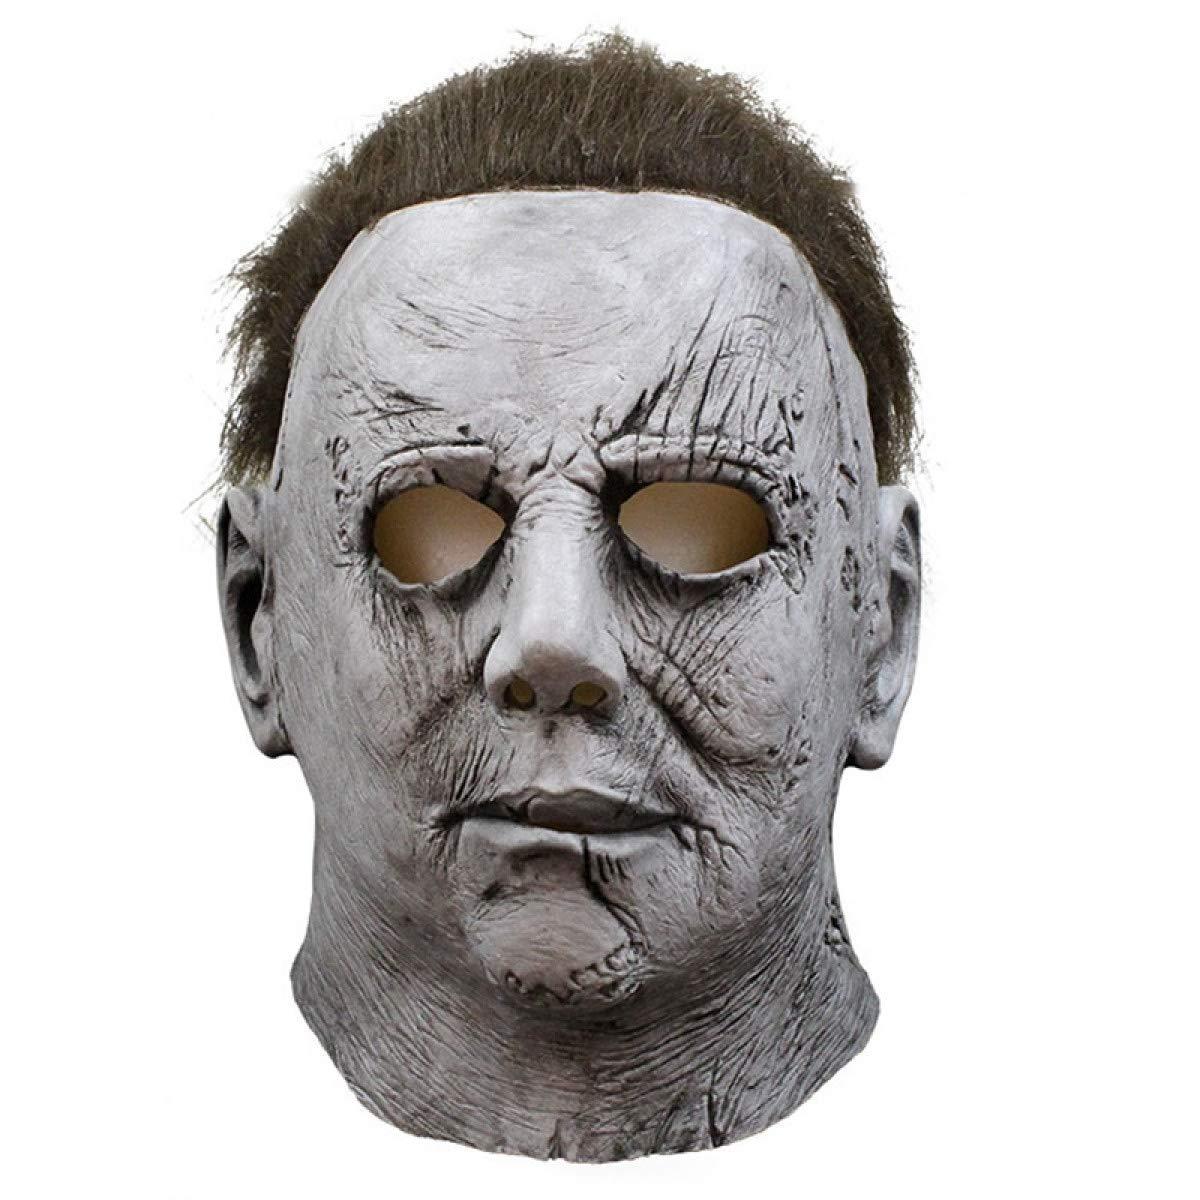 außergewöhnliche Auswahl an Stilen besondere Auswahl an Top-Mode Amazon.com: MELLOW SHOP Michael Myers Mask Halloween ...